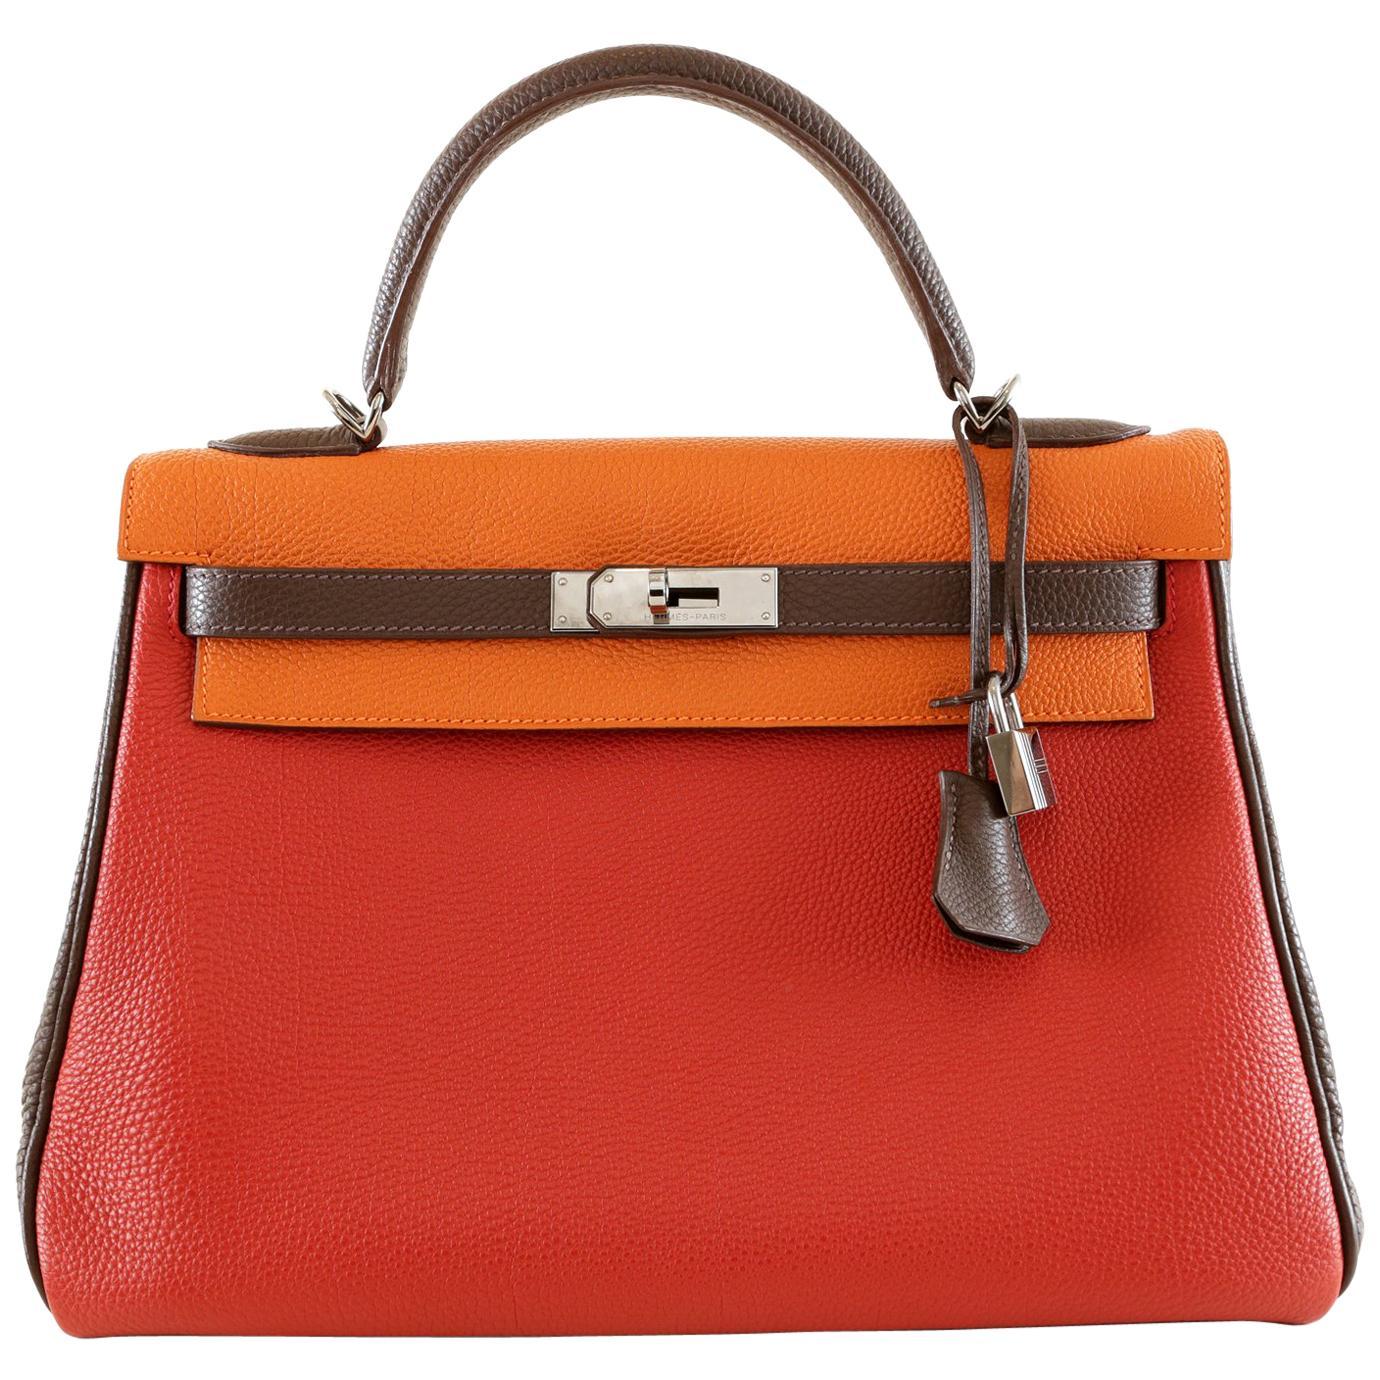 Hermès Tri Color Togo Leather 32 cm Kelly Bag - Limited Edition